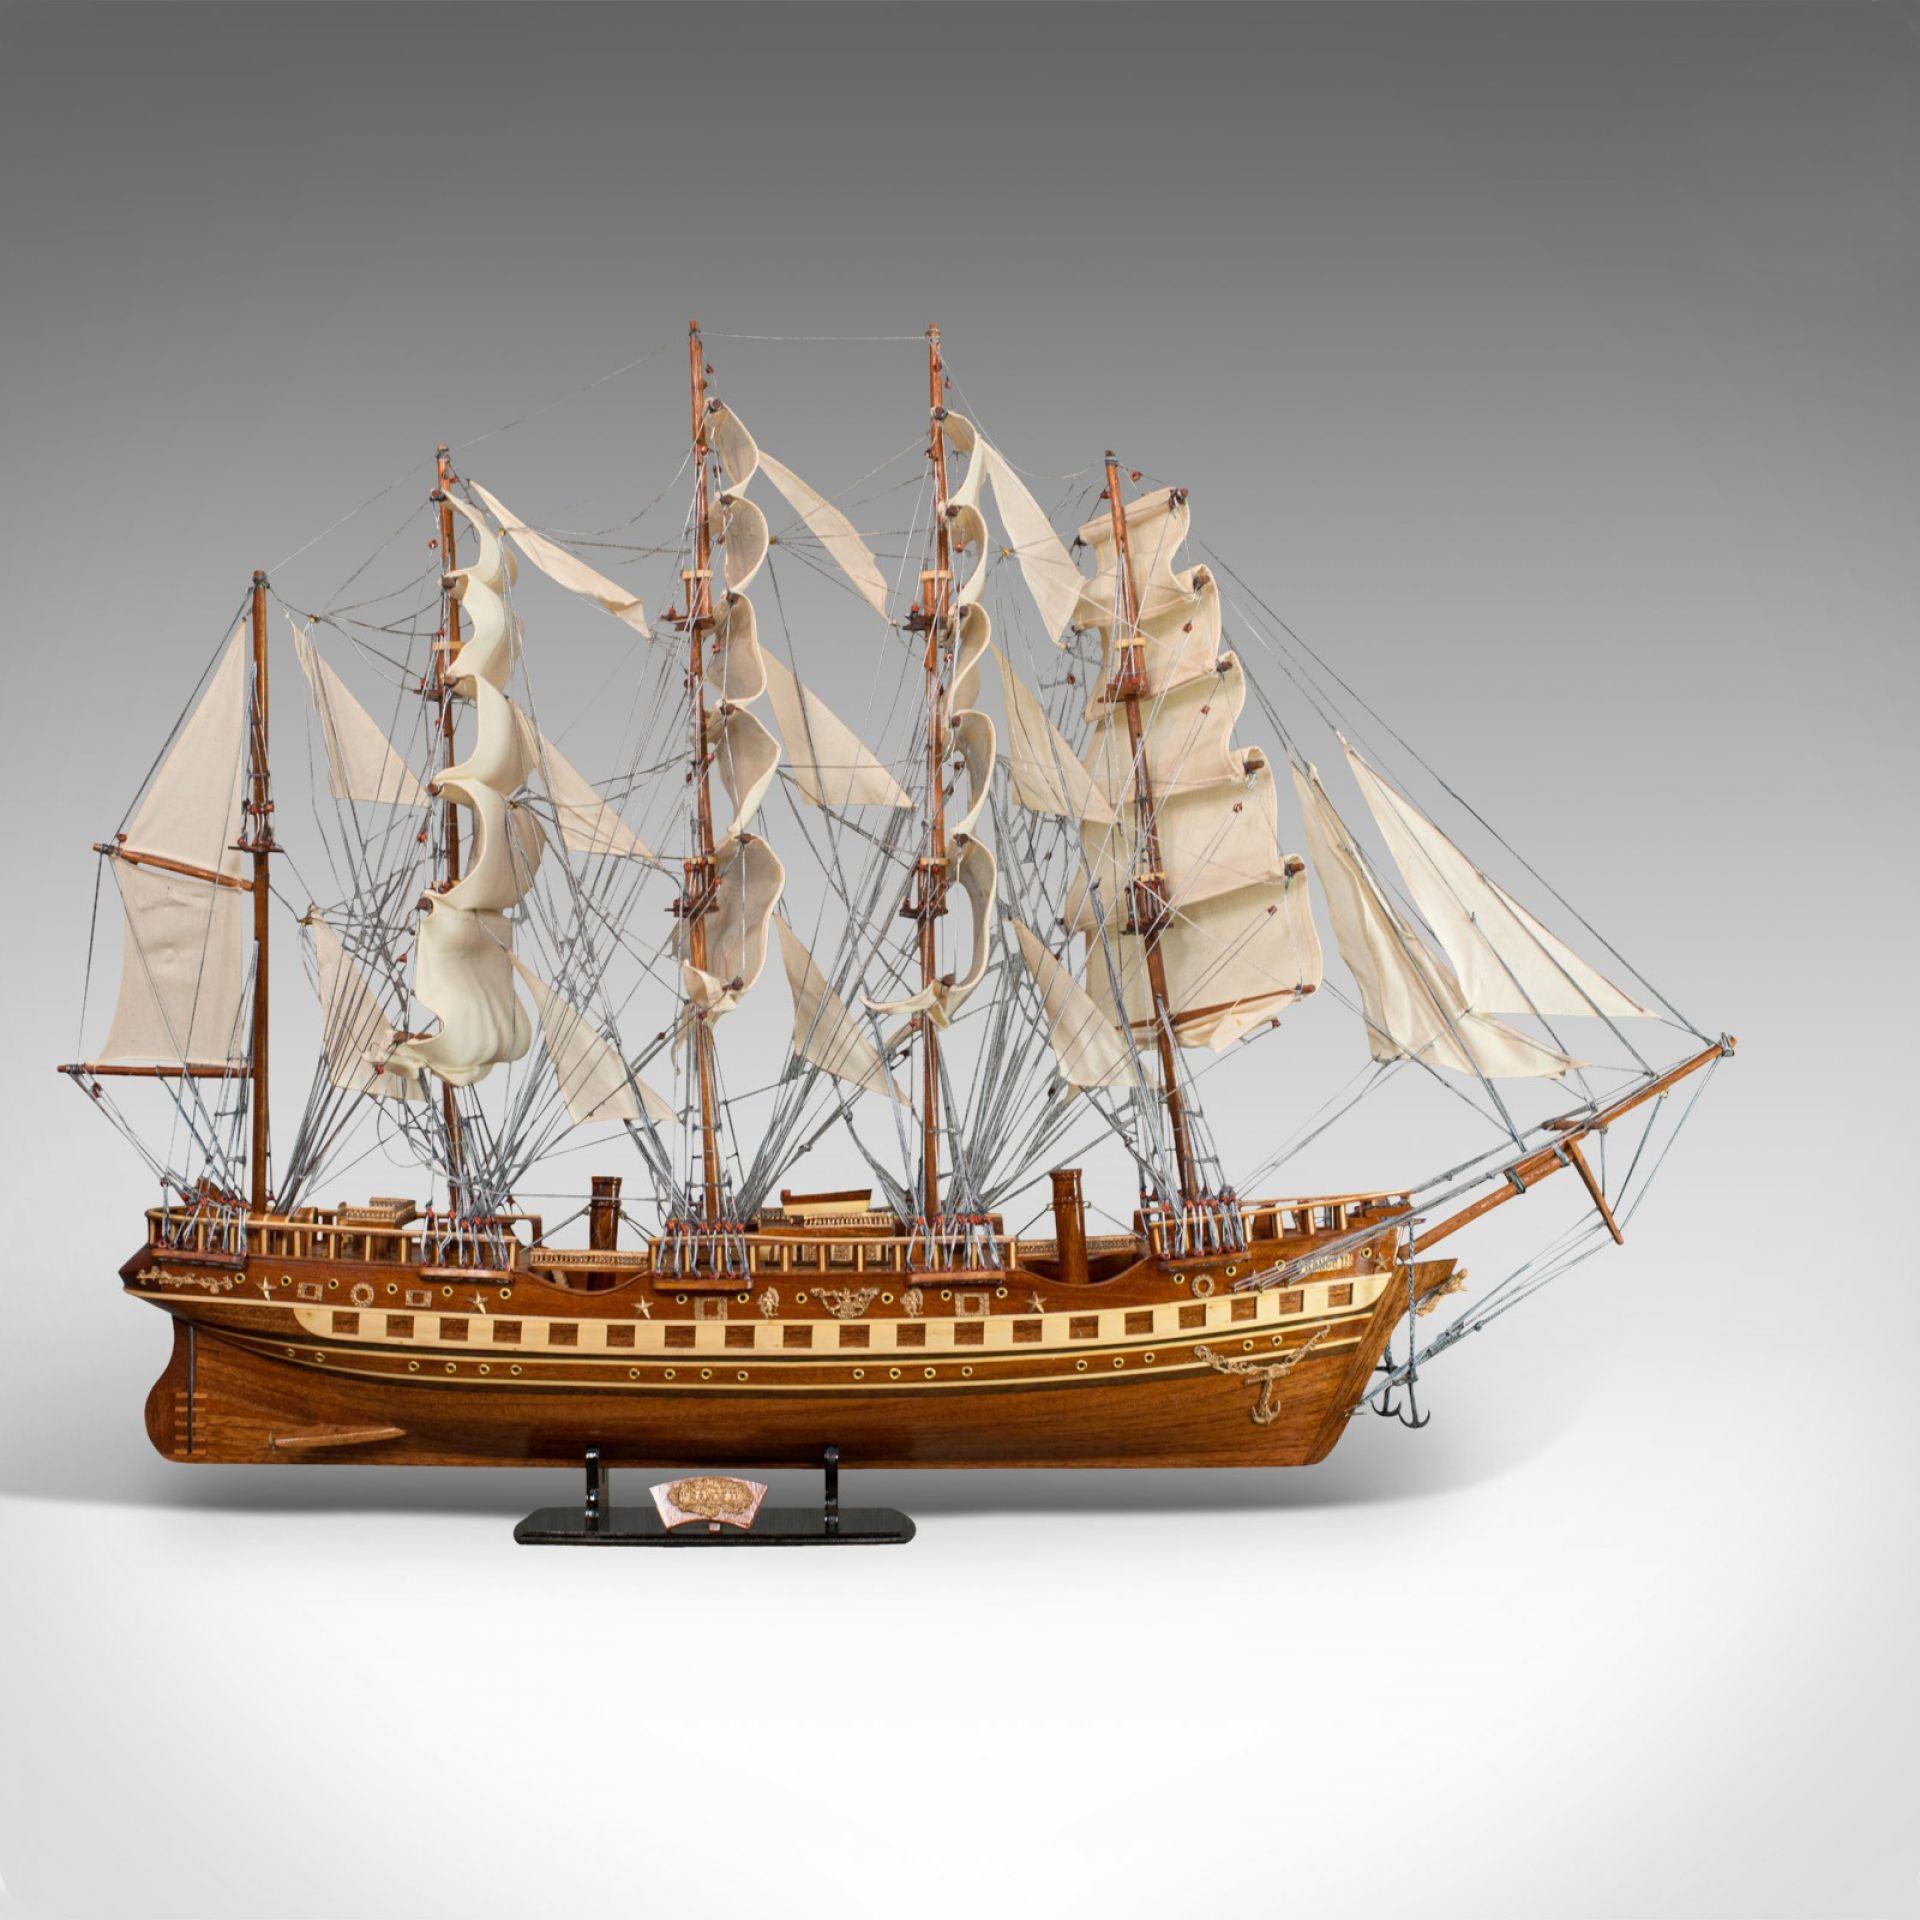 Large Vintage Model, France II, English, Mahogany, Collectible, Ship, Display